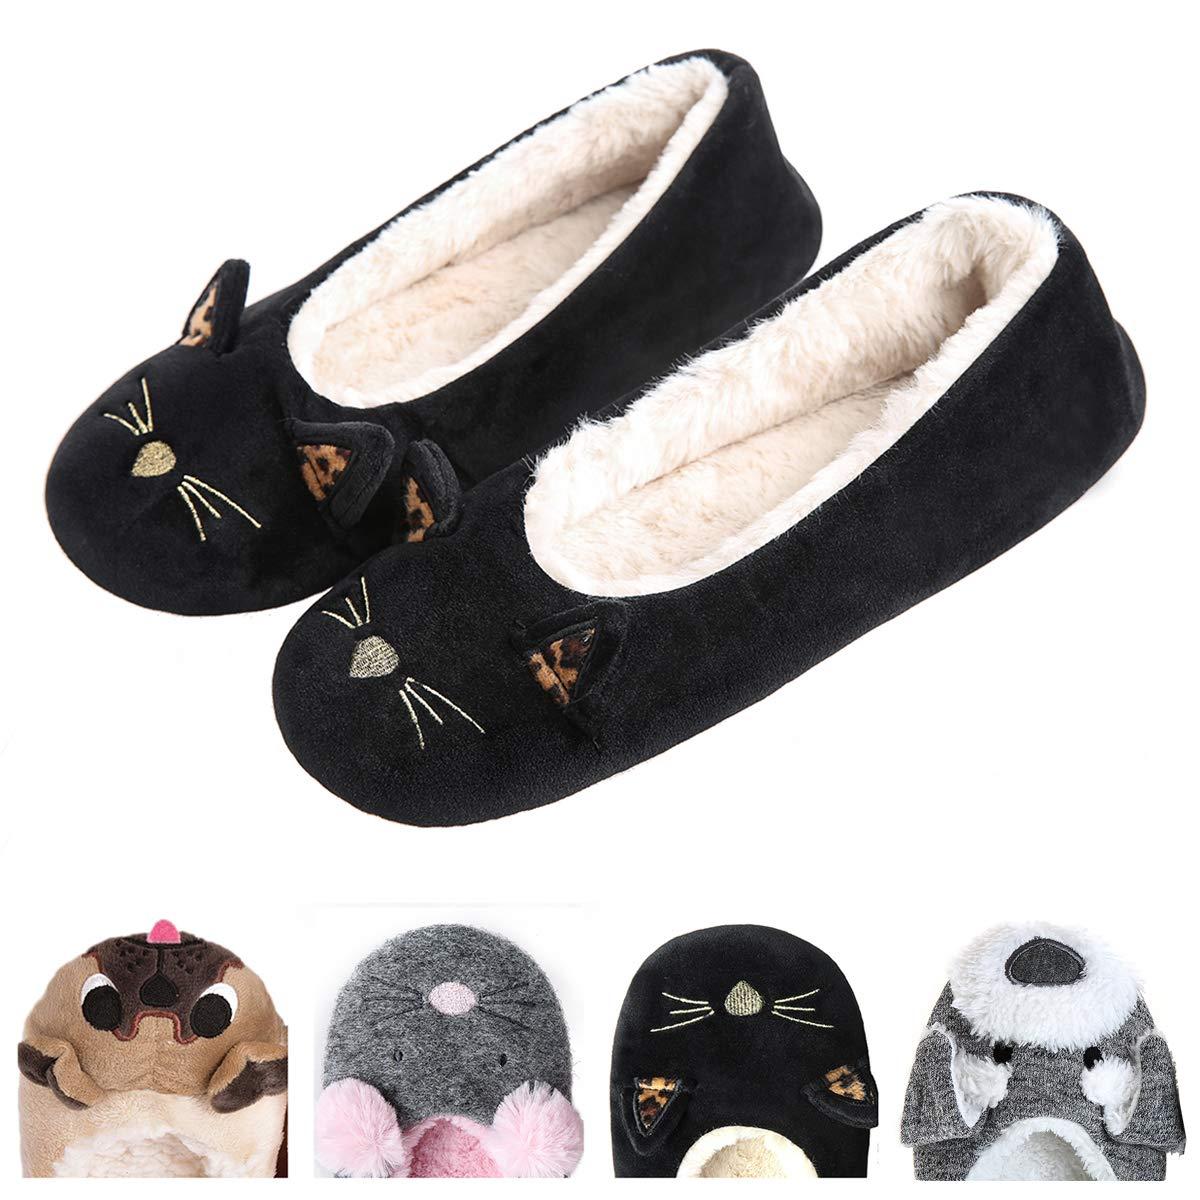 Women's Plush Winter Warm Animal Soft Cute Home Slippers Dog XZ-HMXX018